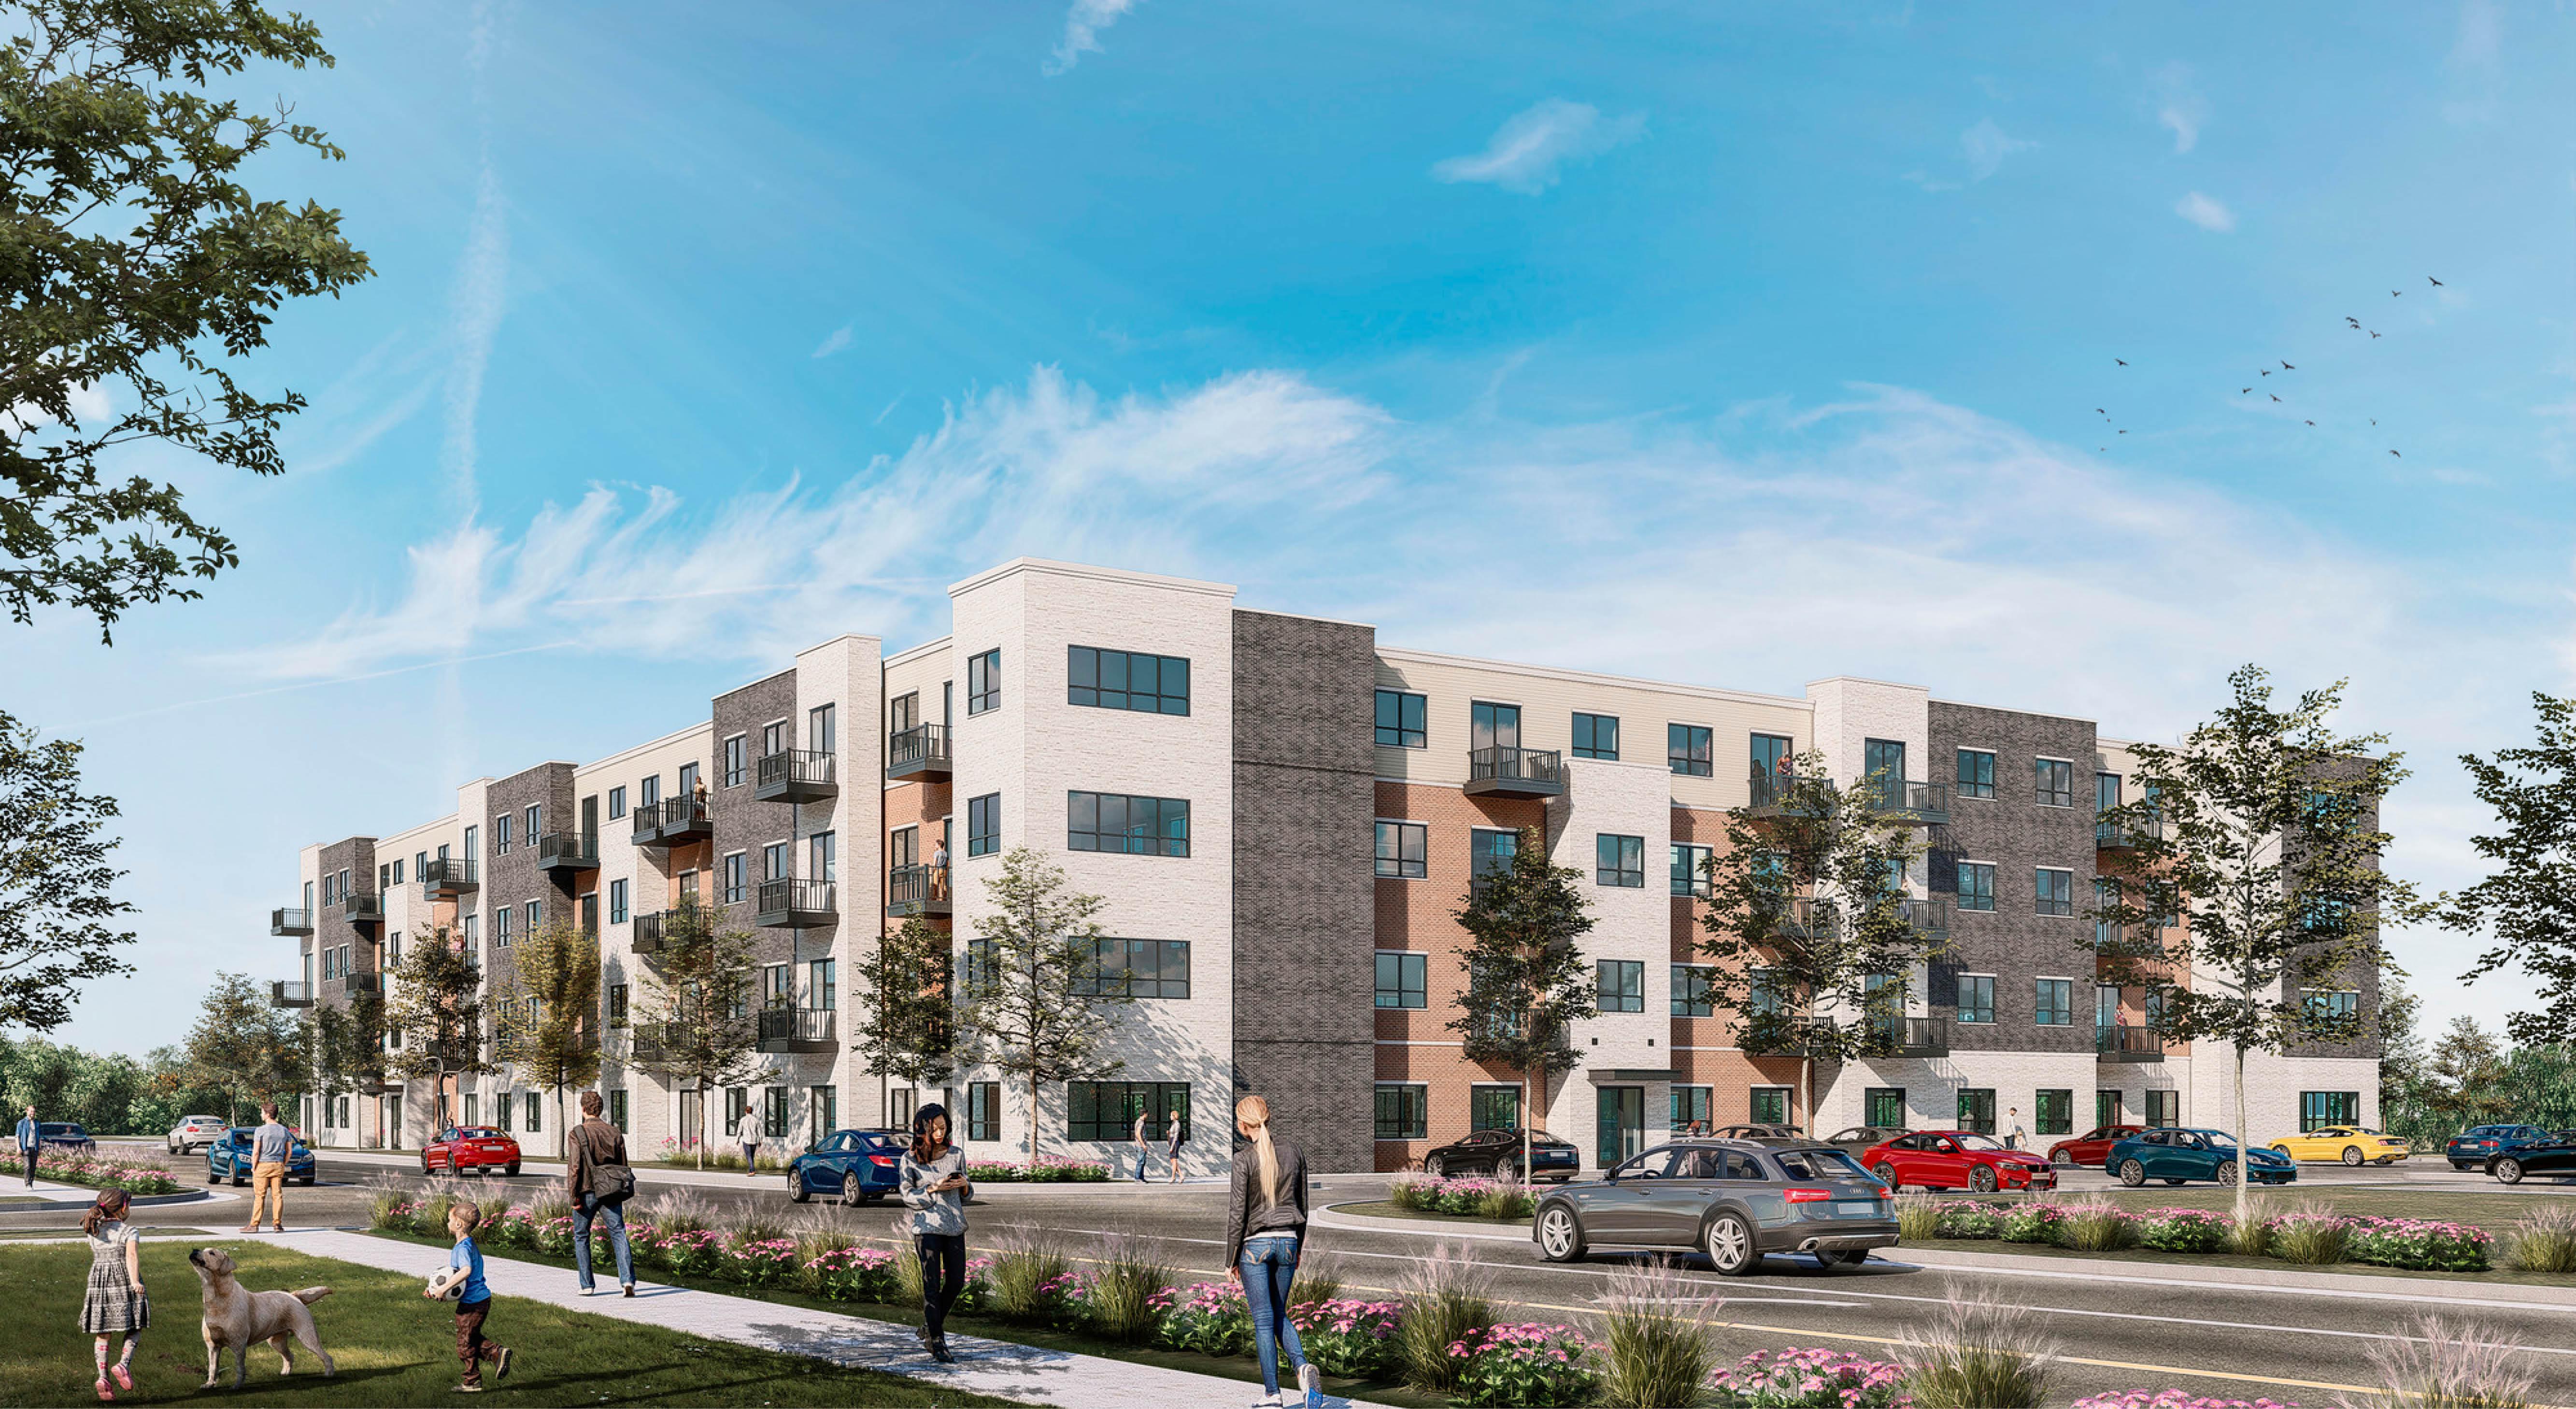 South Elgin Multi-Family building rendering